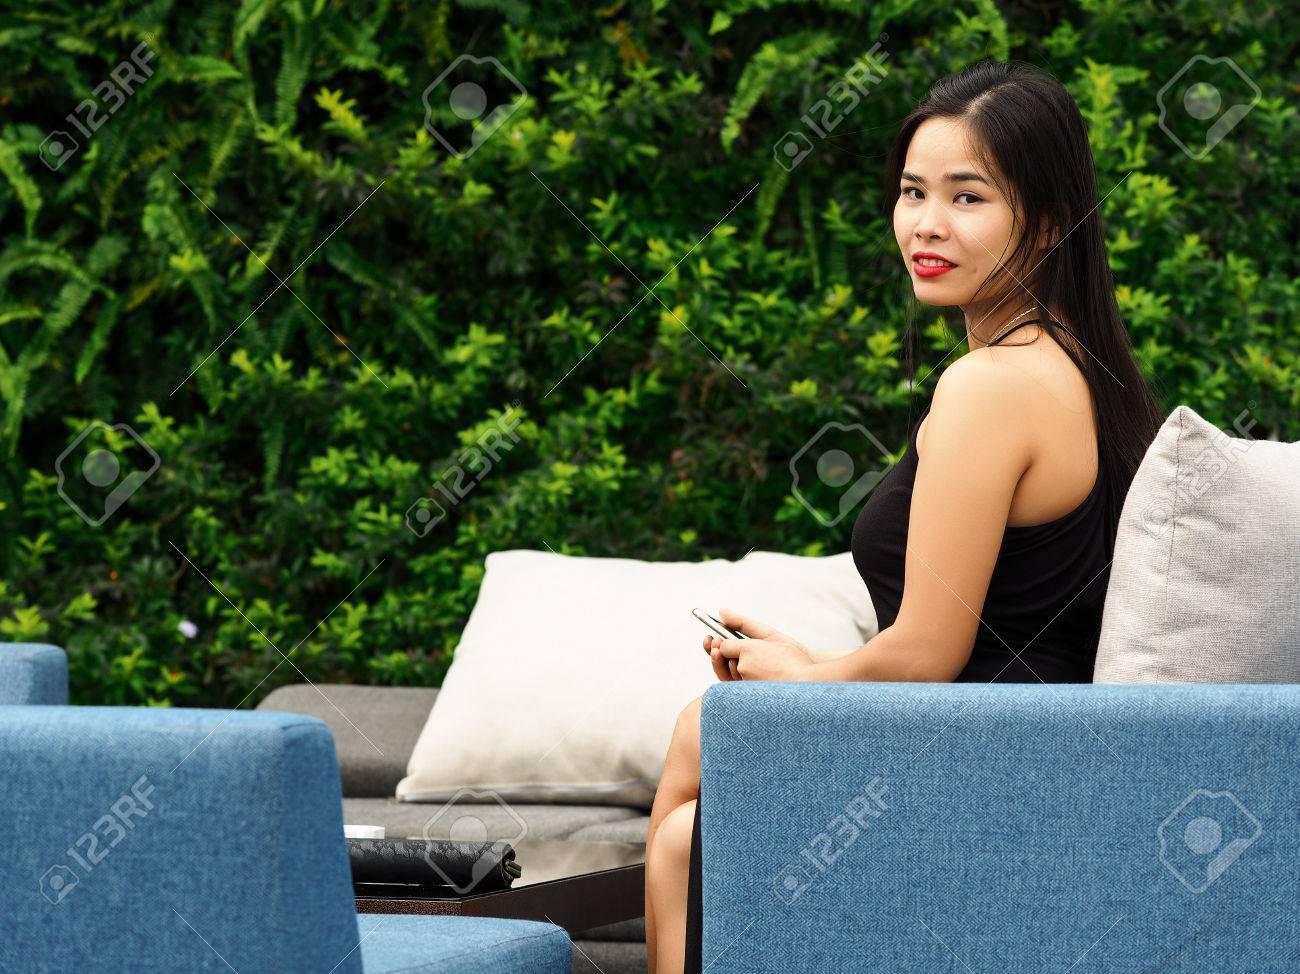 Vietnam dating service online dating i Tamil Nadu